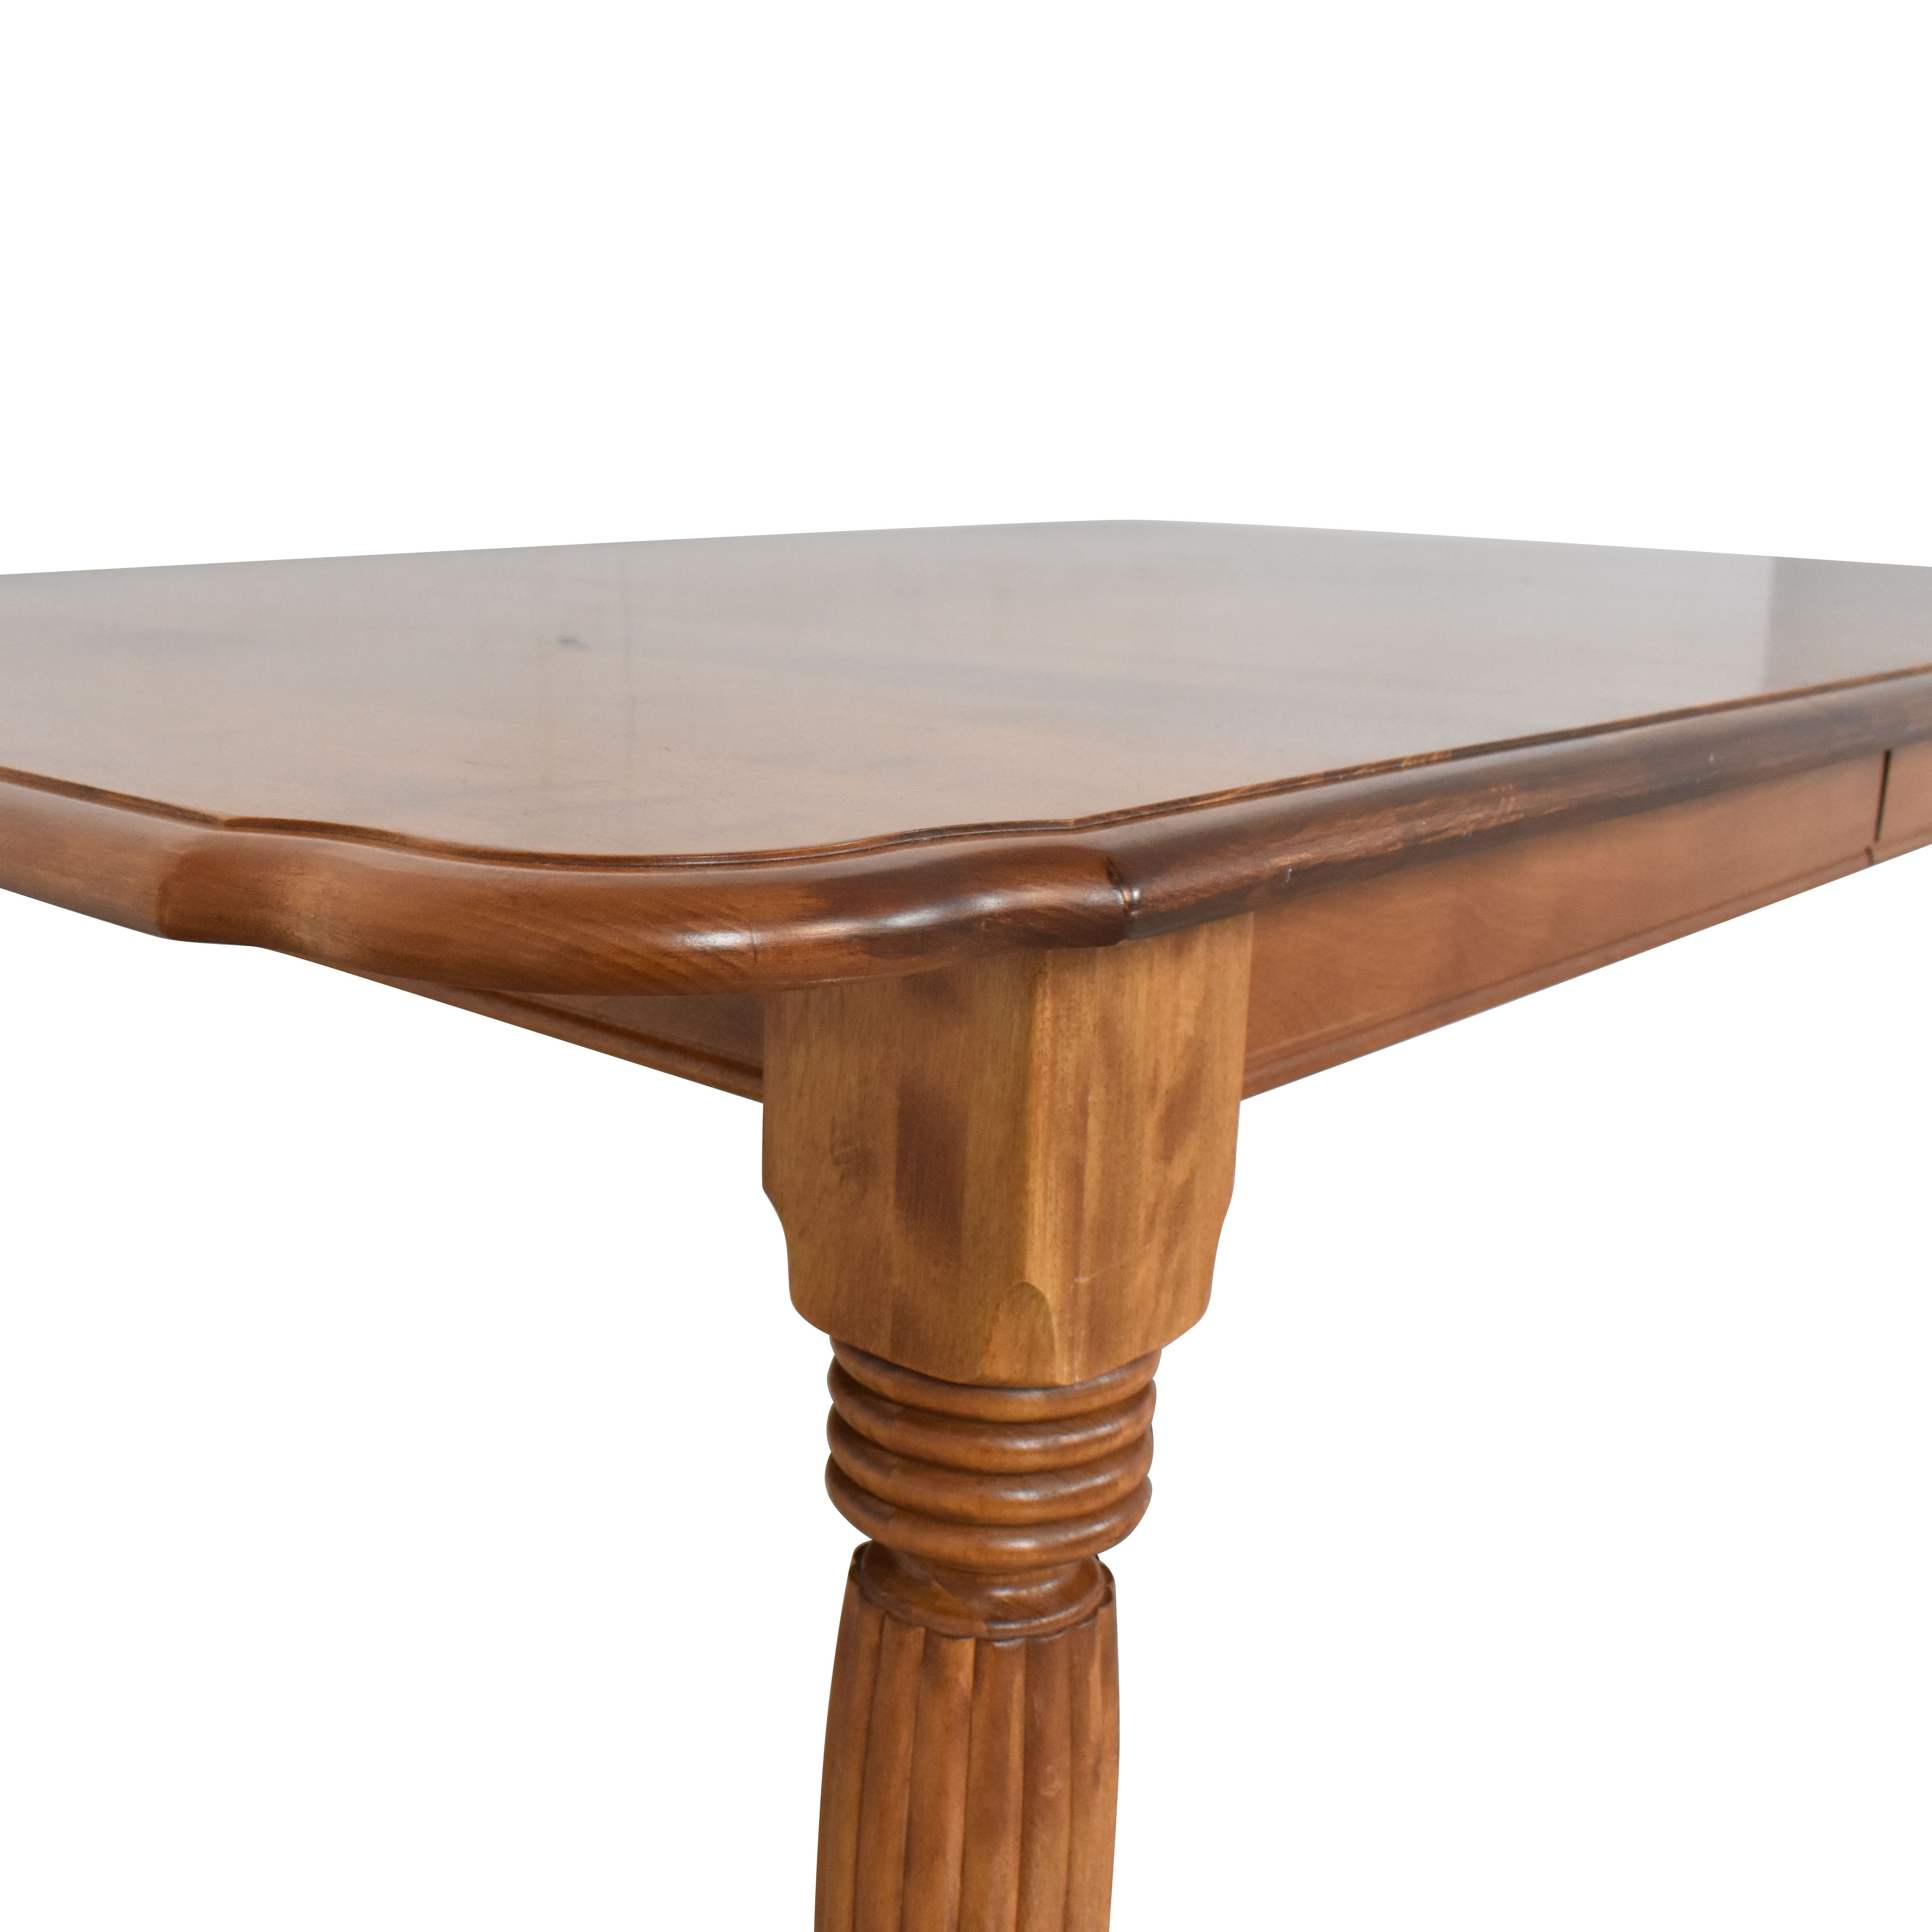 Nichols & Stone Nichols & Stone Extendable Dining Table nj